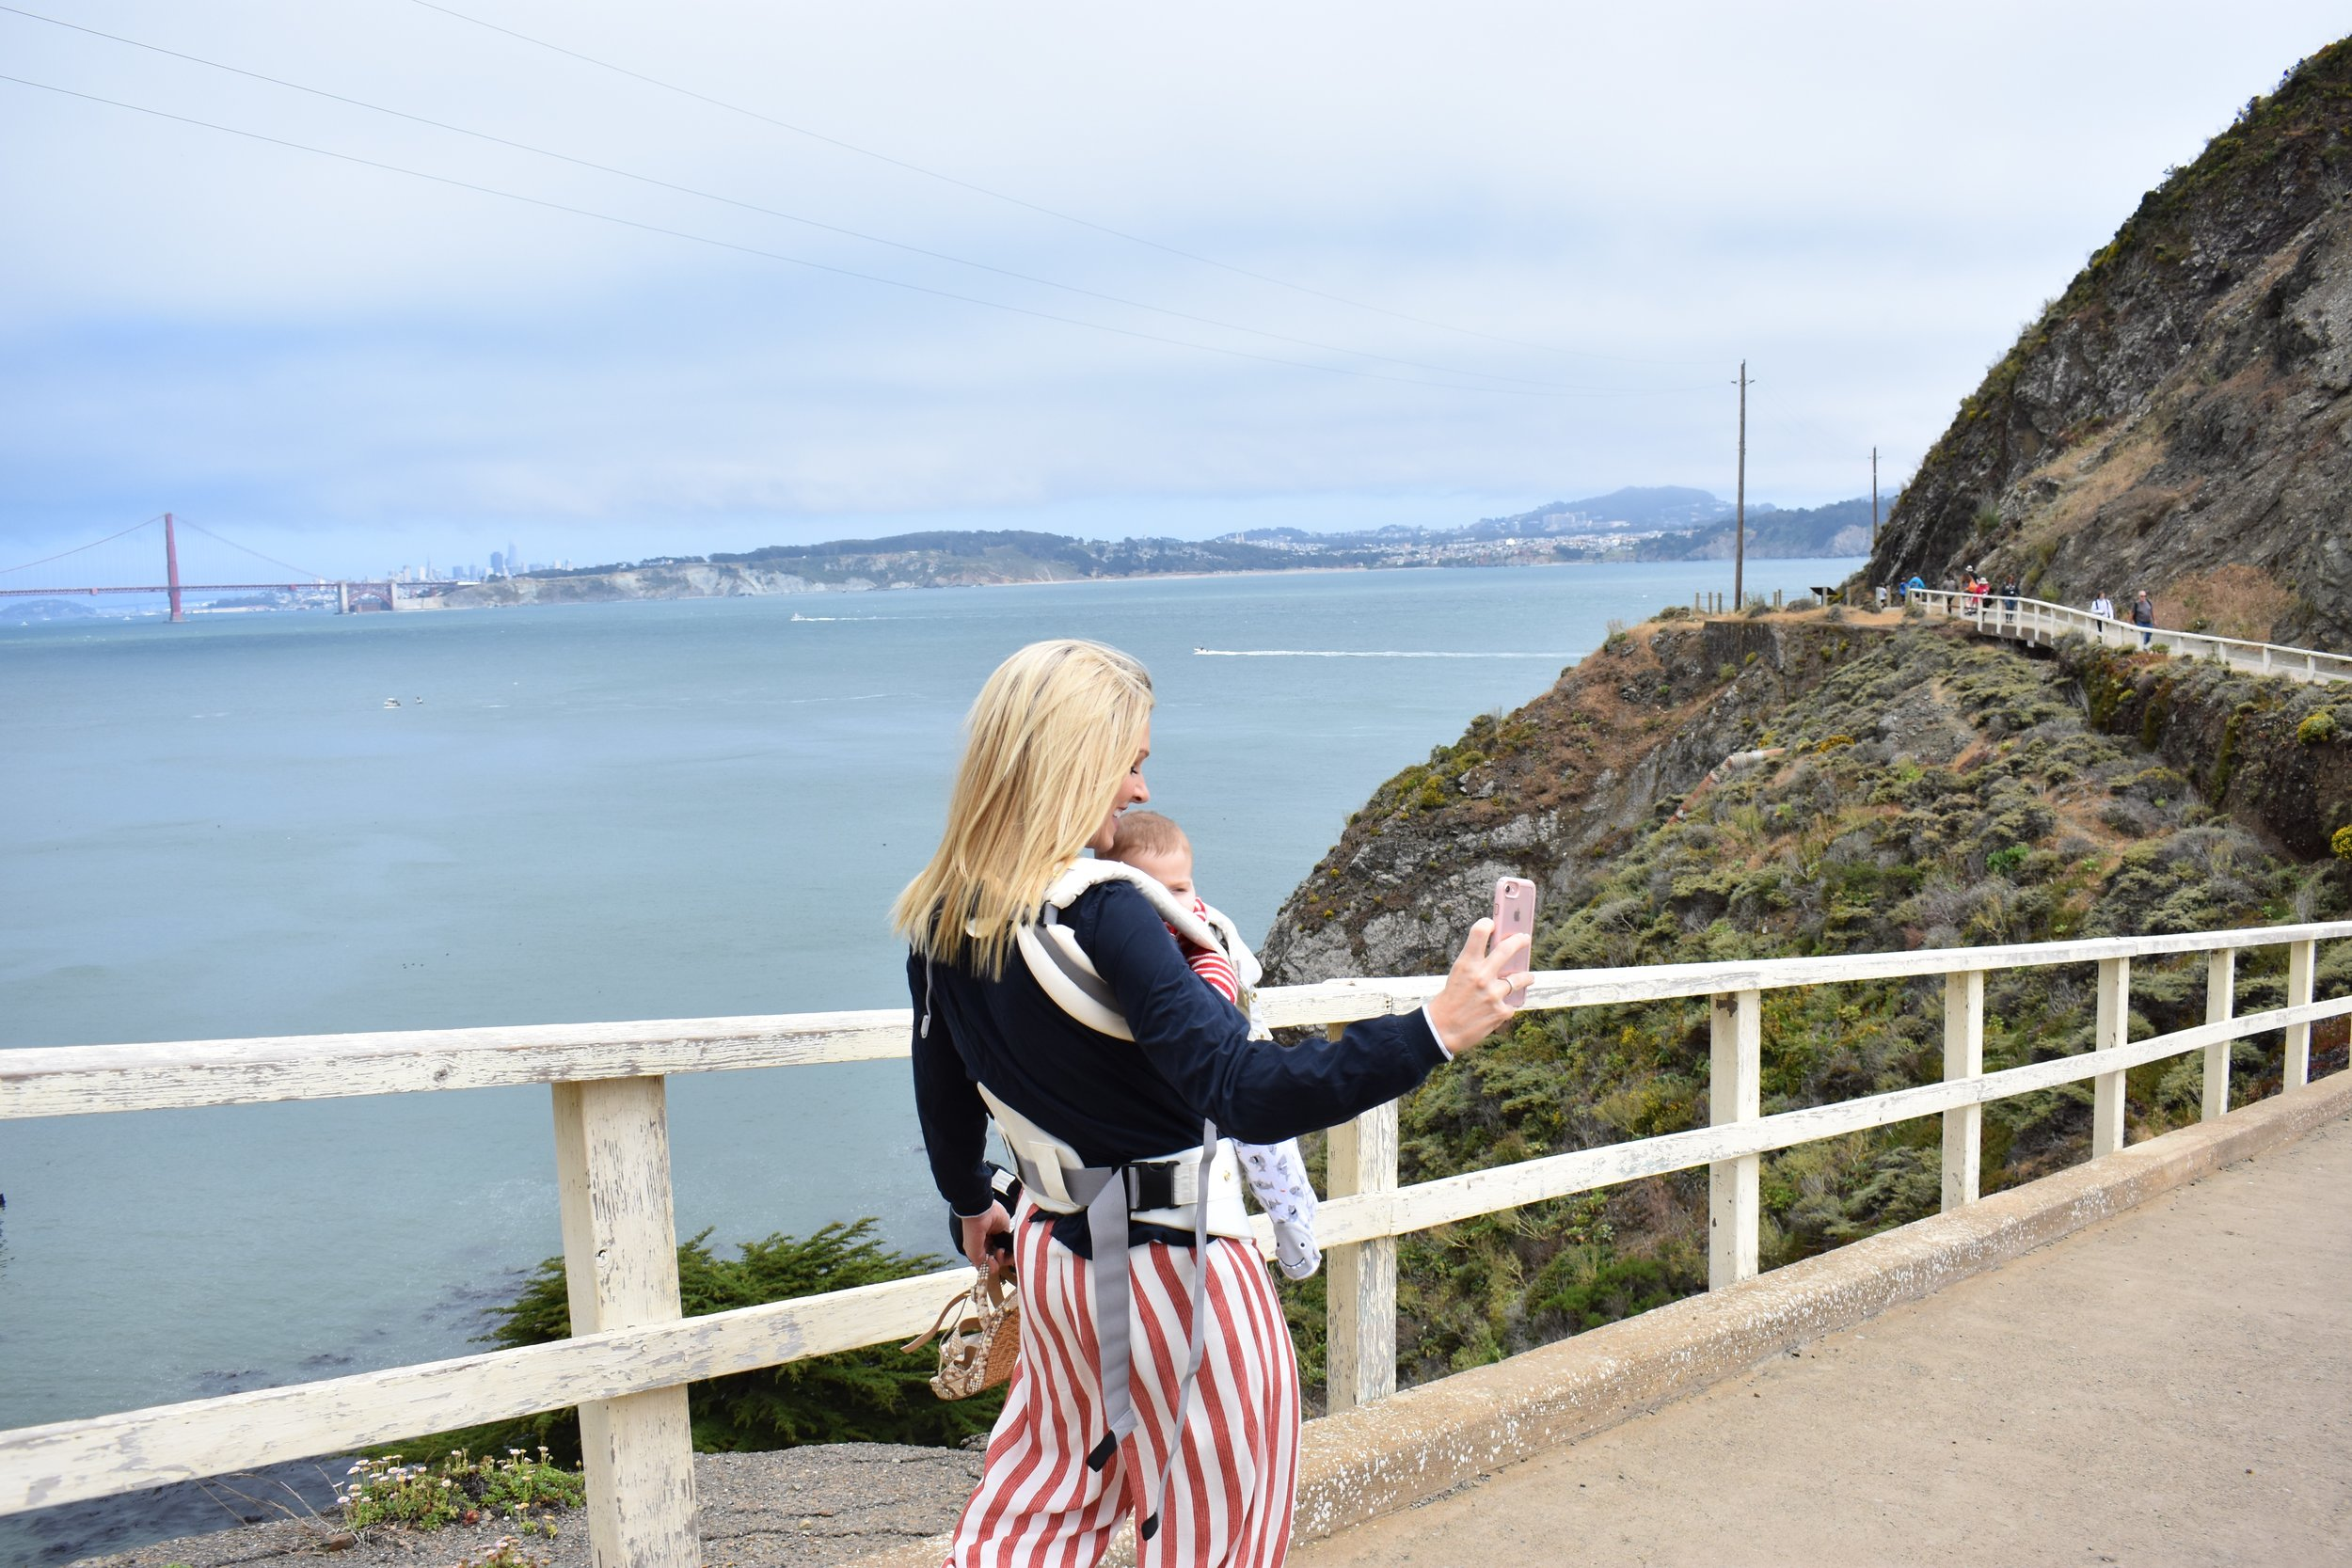 Anna Kooiman San Francisco Fourth of July fashion wild fox couture born in the usa fitness travel lifestyle kendra scott kk bloom